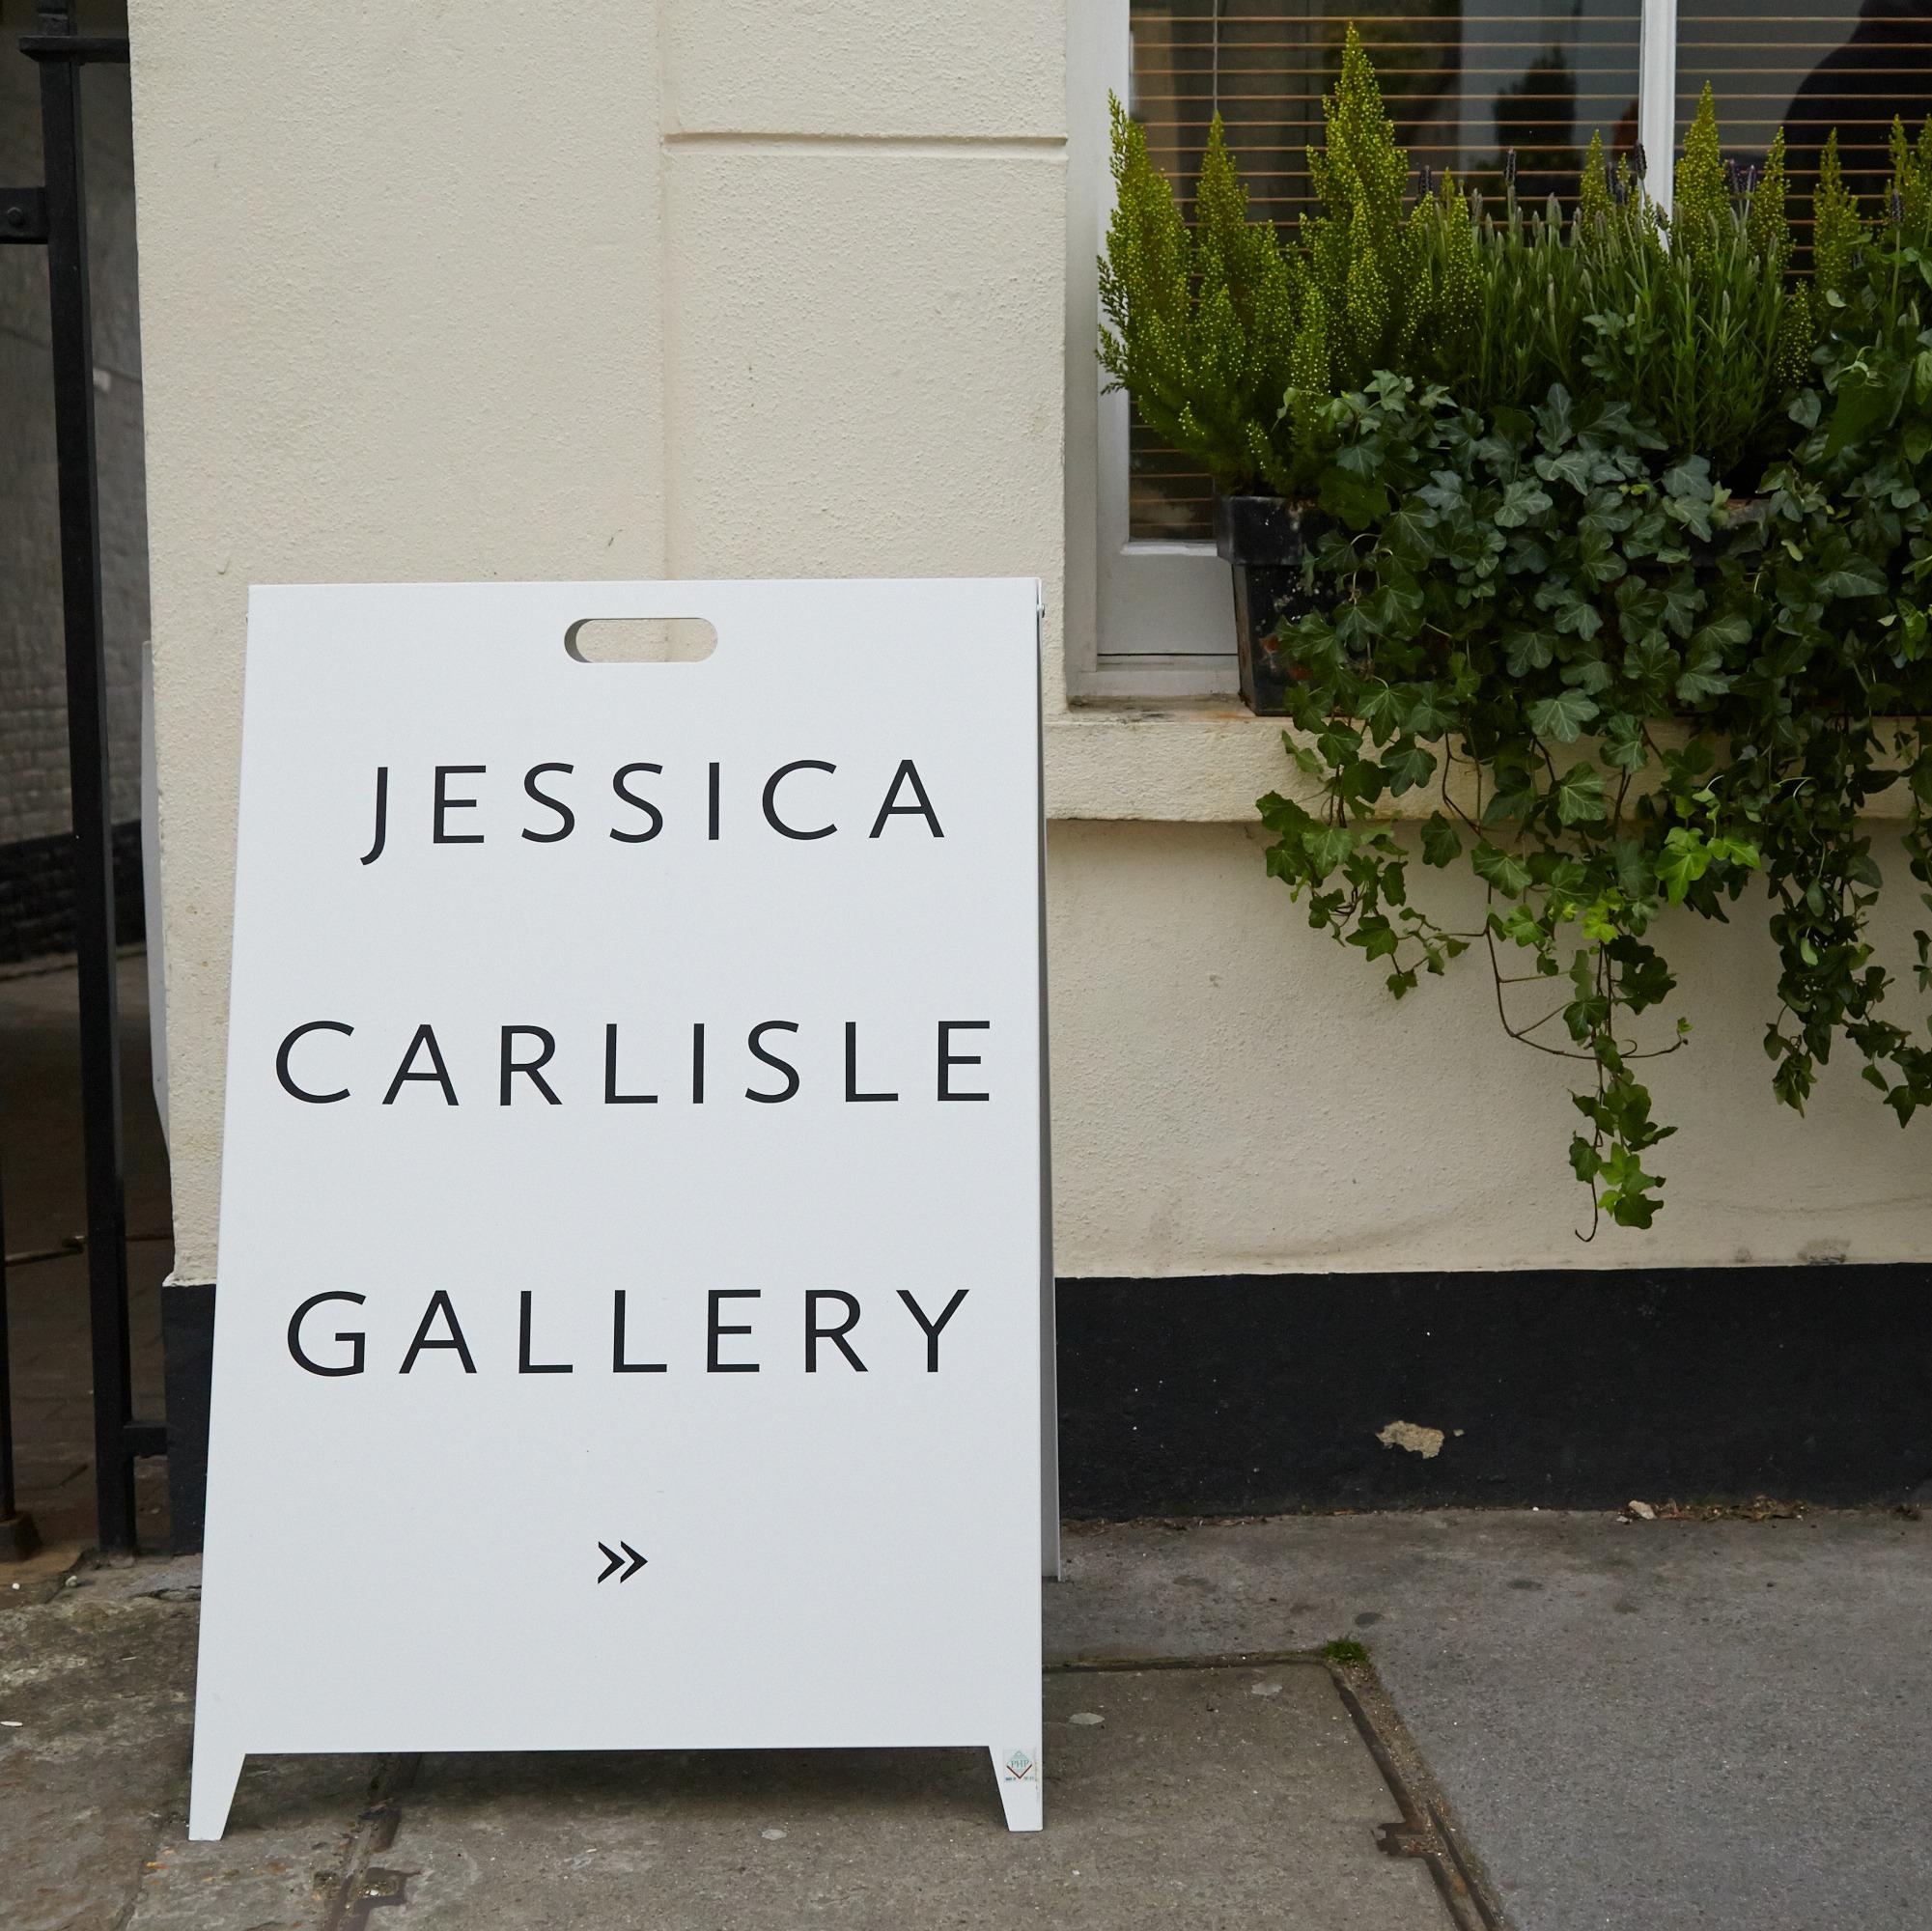 Jessica Carlisle Gallery - London - Hester Finch - Humphrey Munson Blog 1